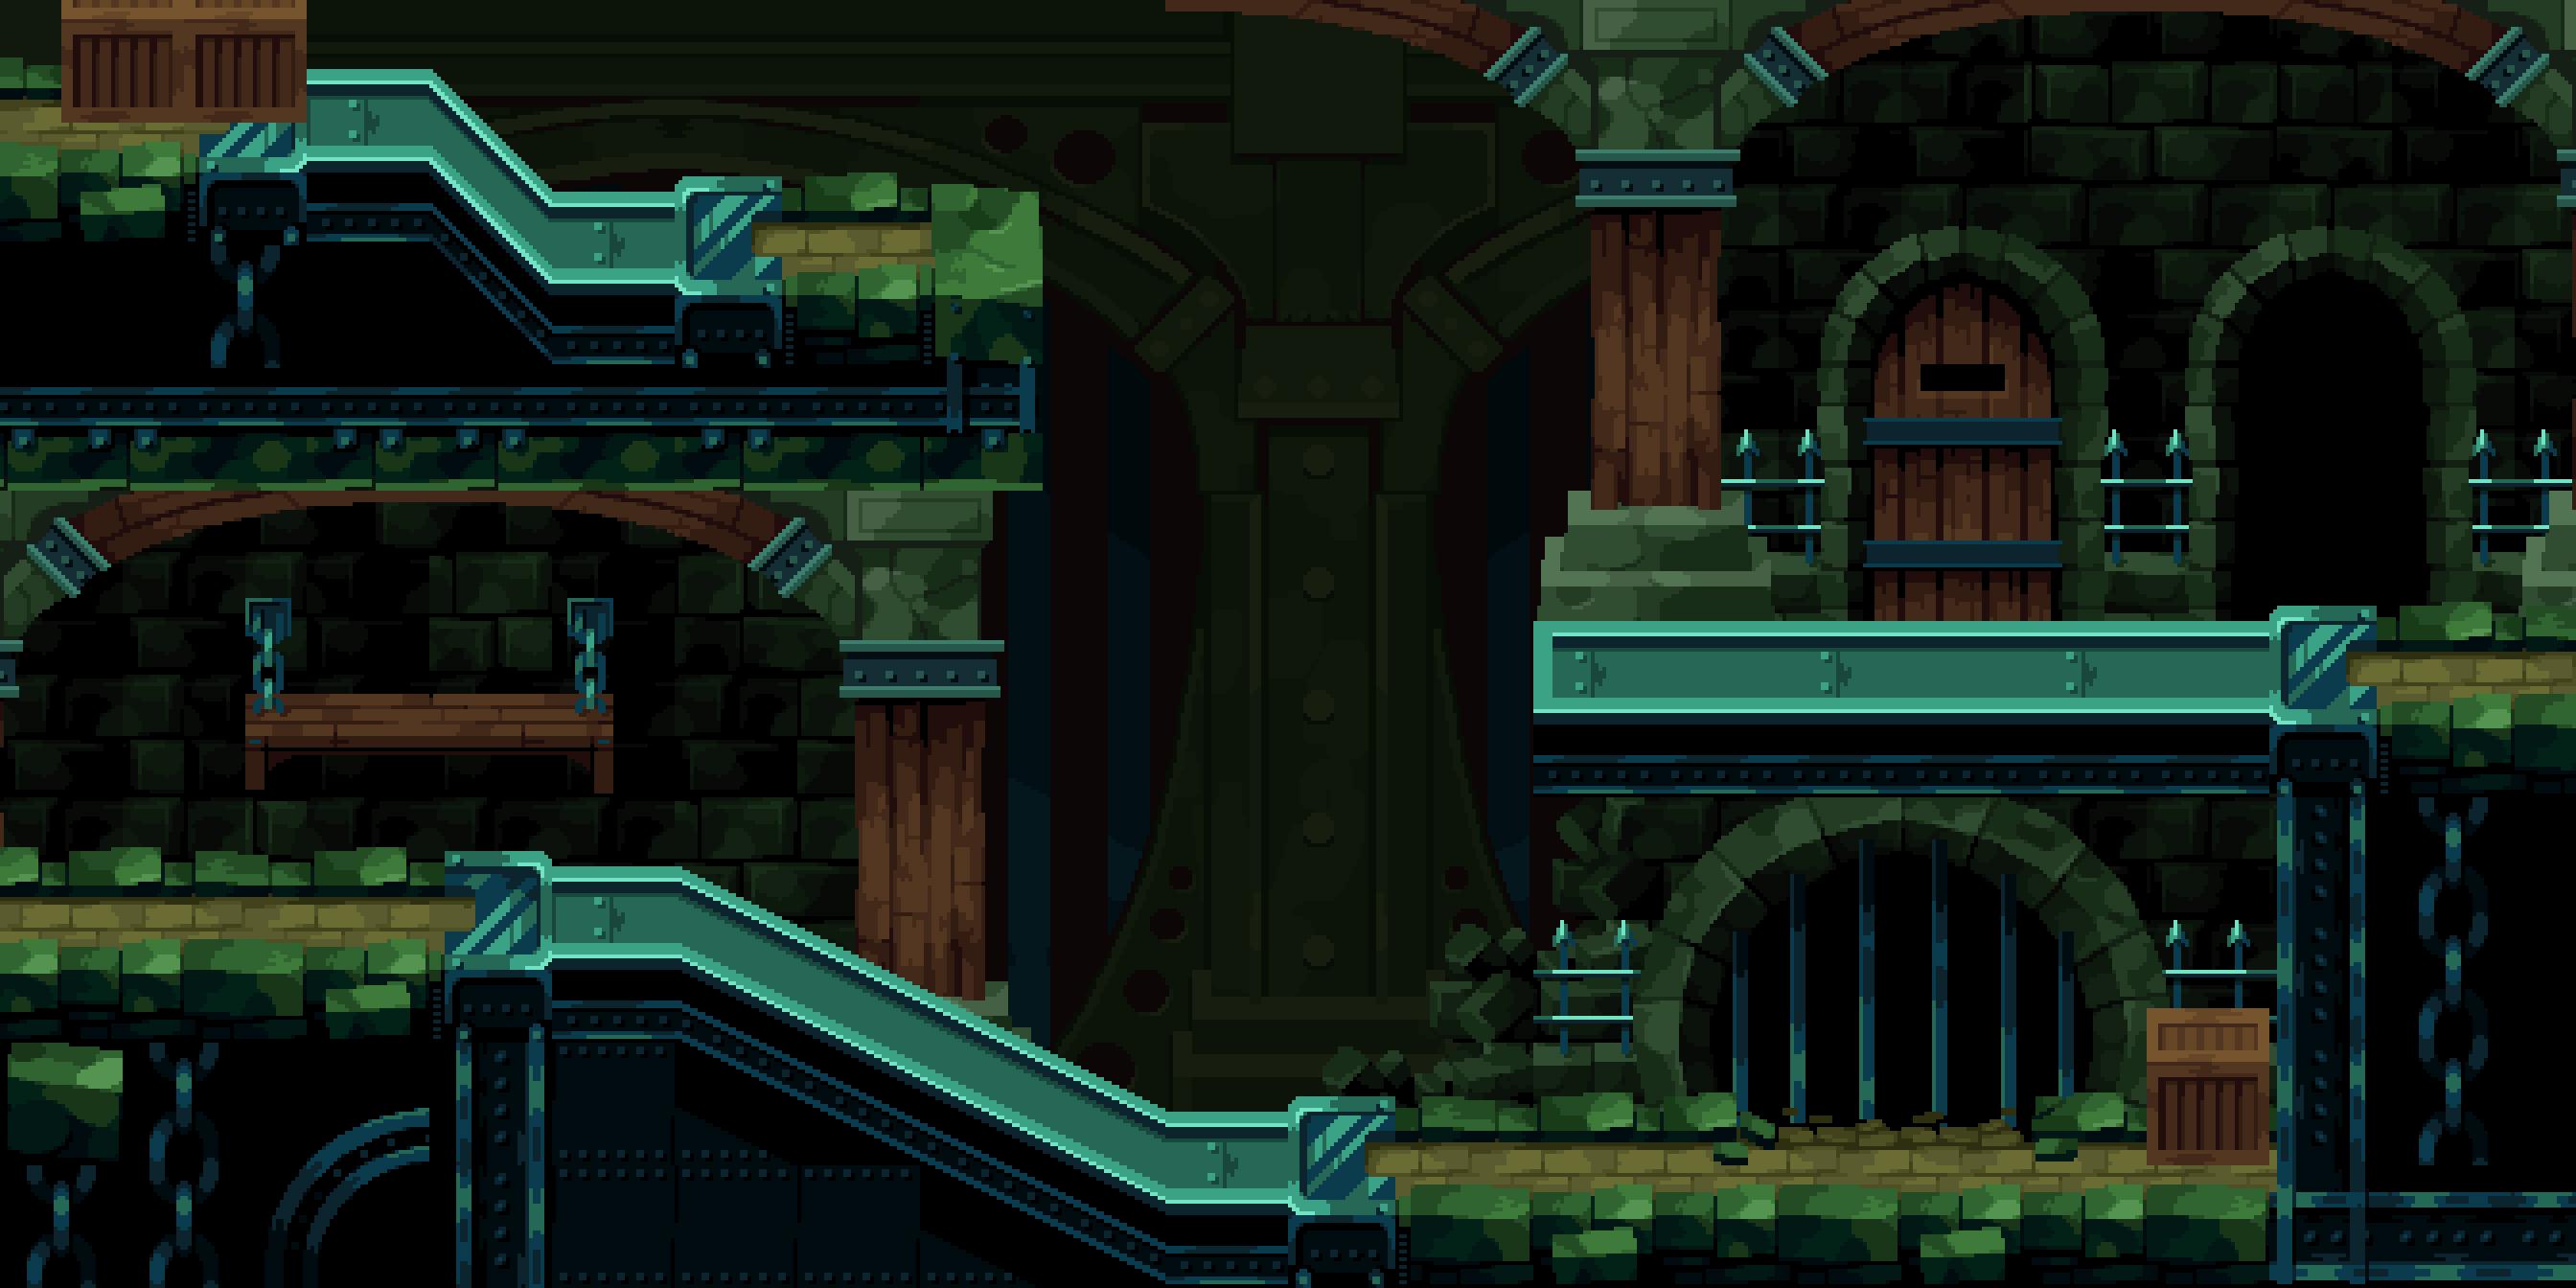 Hero's Journey - Dungeon Prison